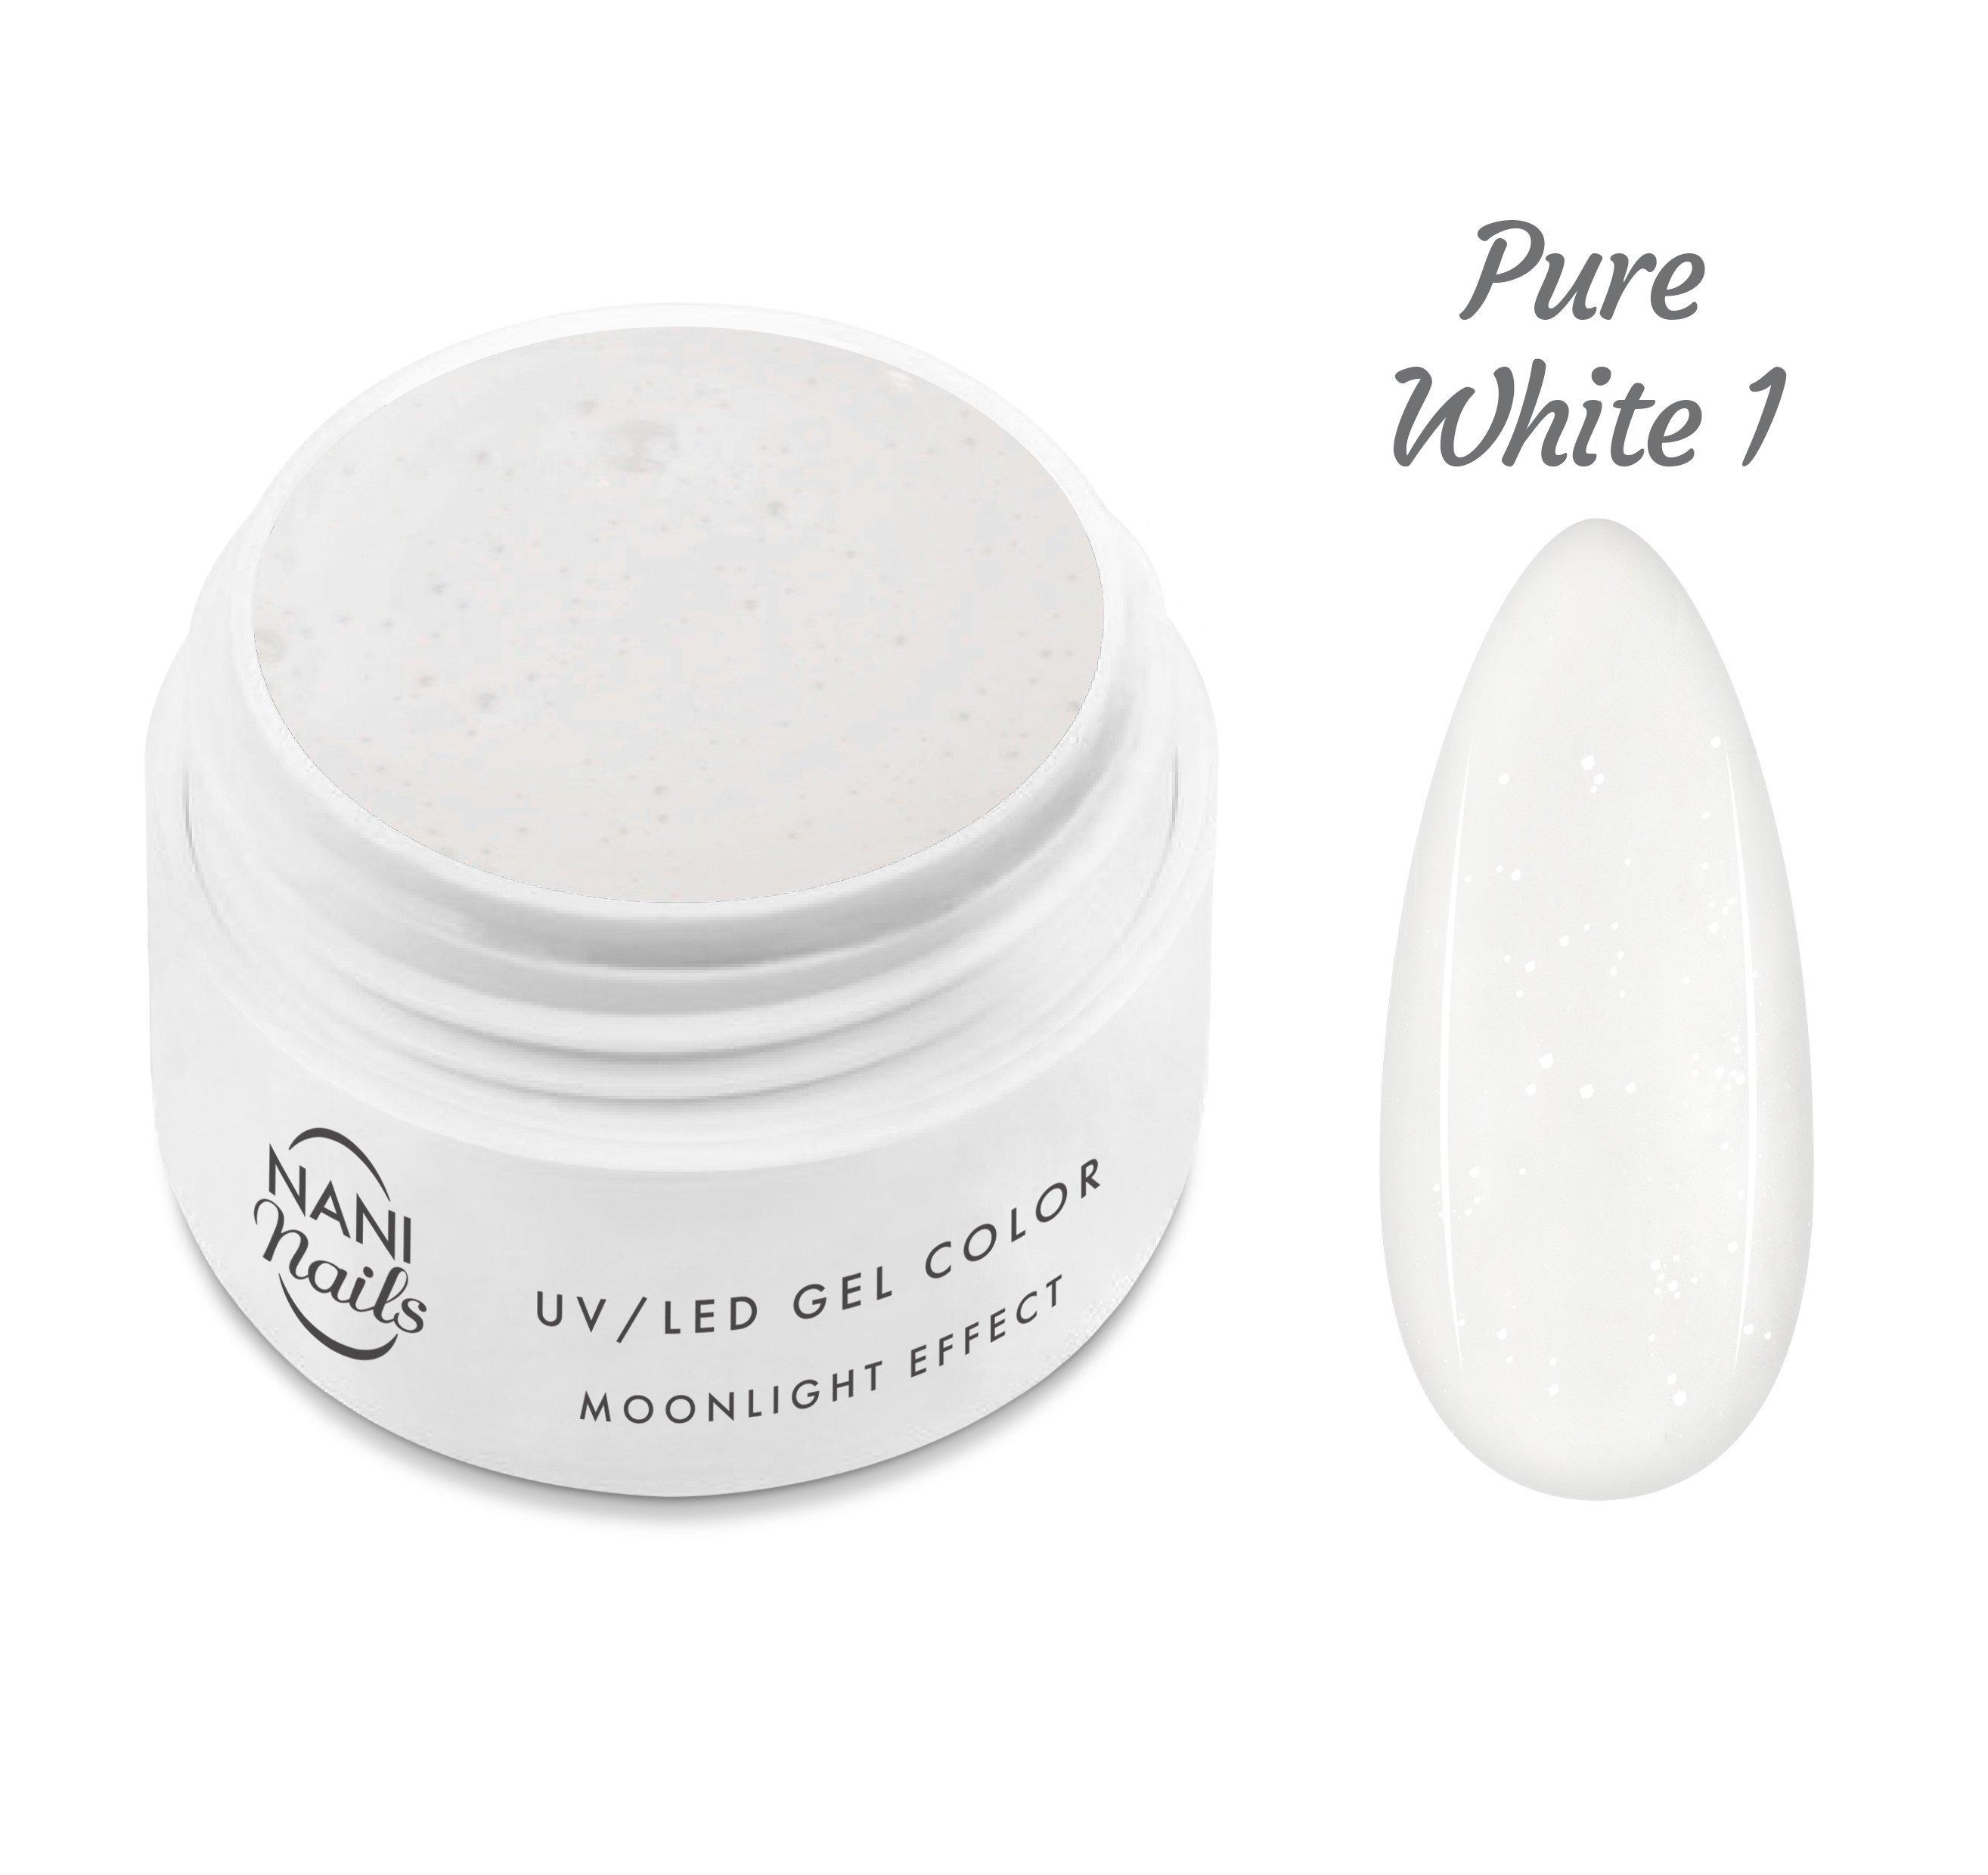 NANI UV gél Moonlight Effect 5 ml - Pure White